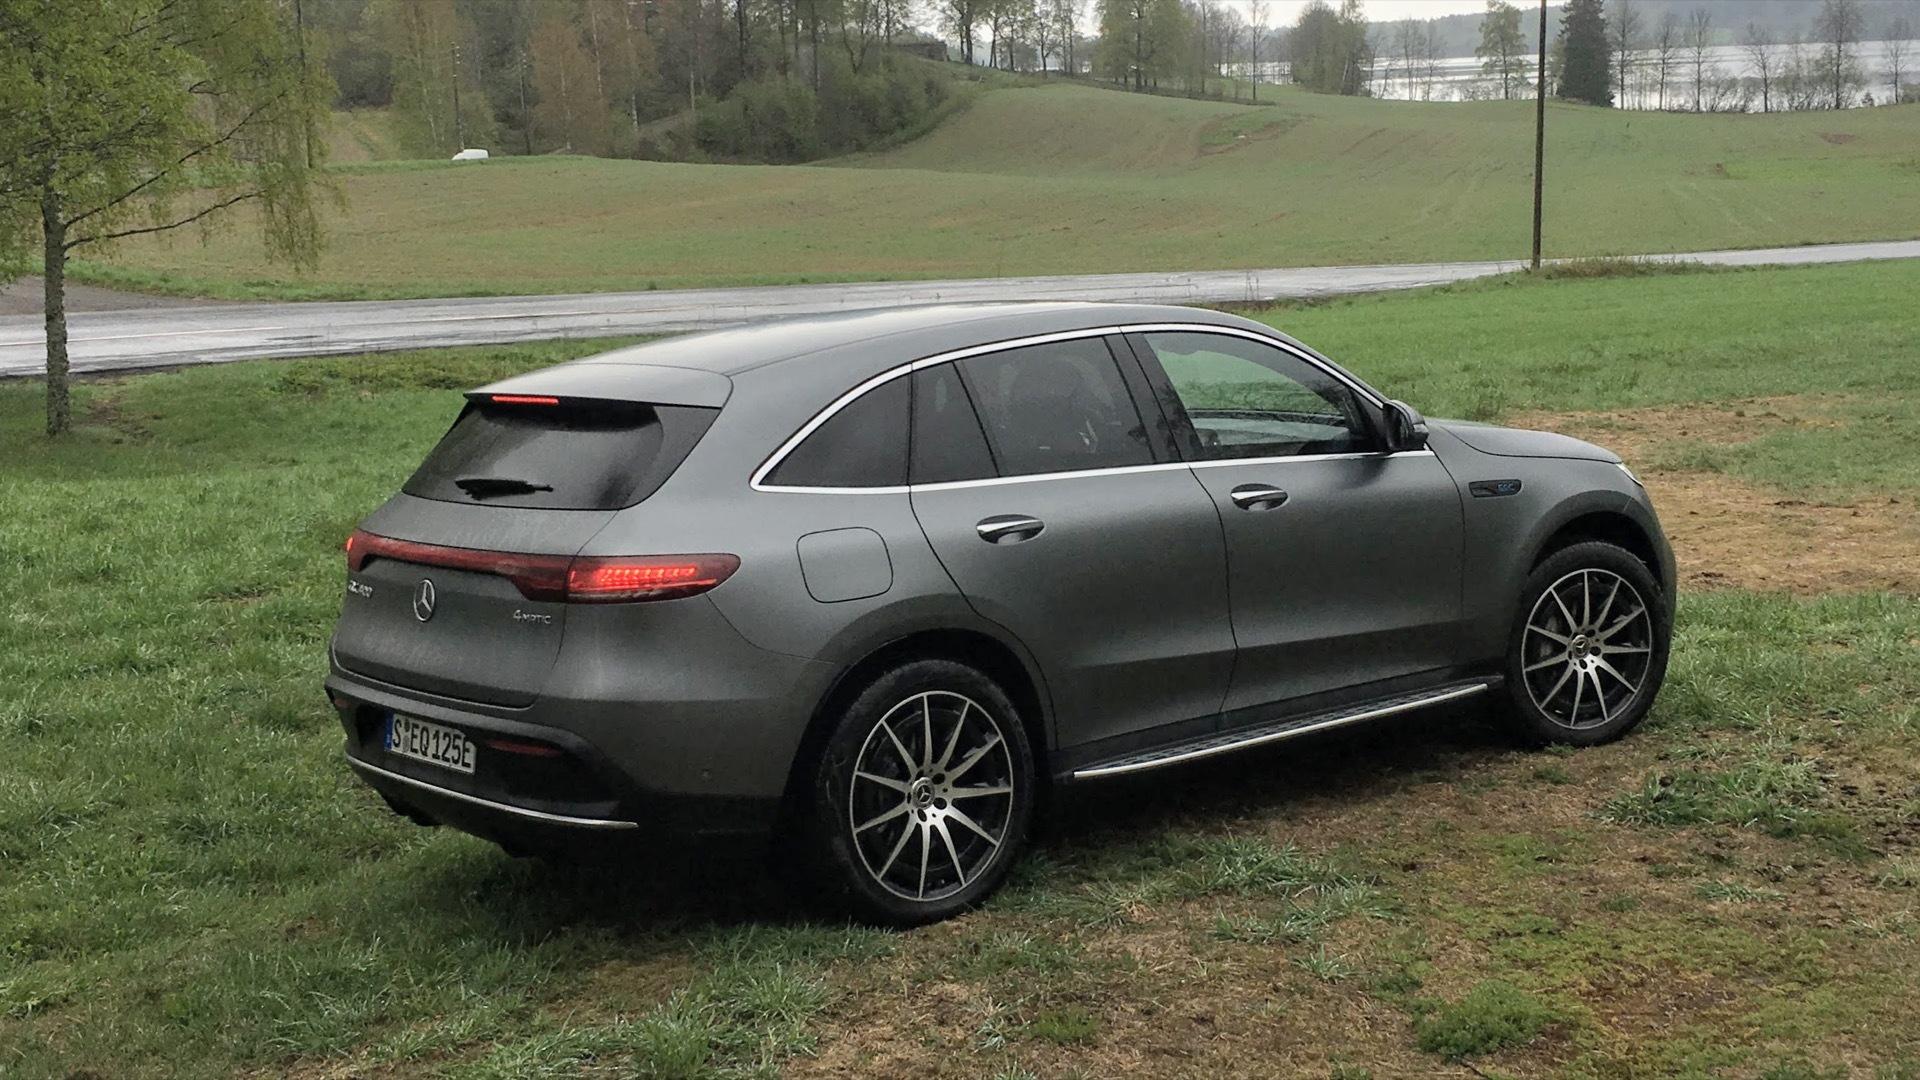 2020 Mercedes EQC: Design, Specs, Mileage, Arrival >> First Drive Review 2020 Mercedes Benz Eqc Electric